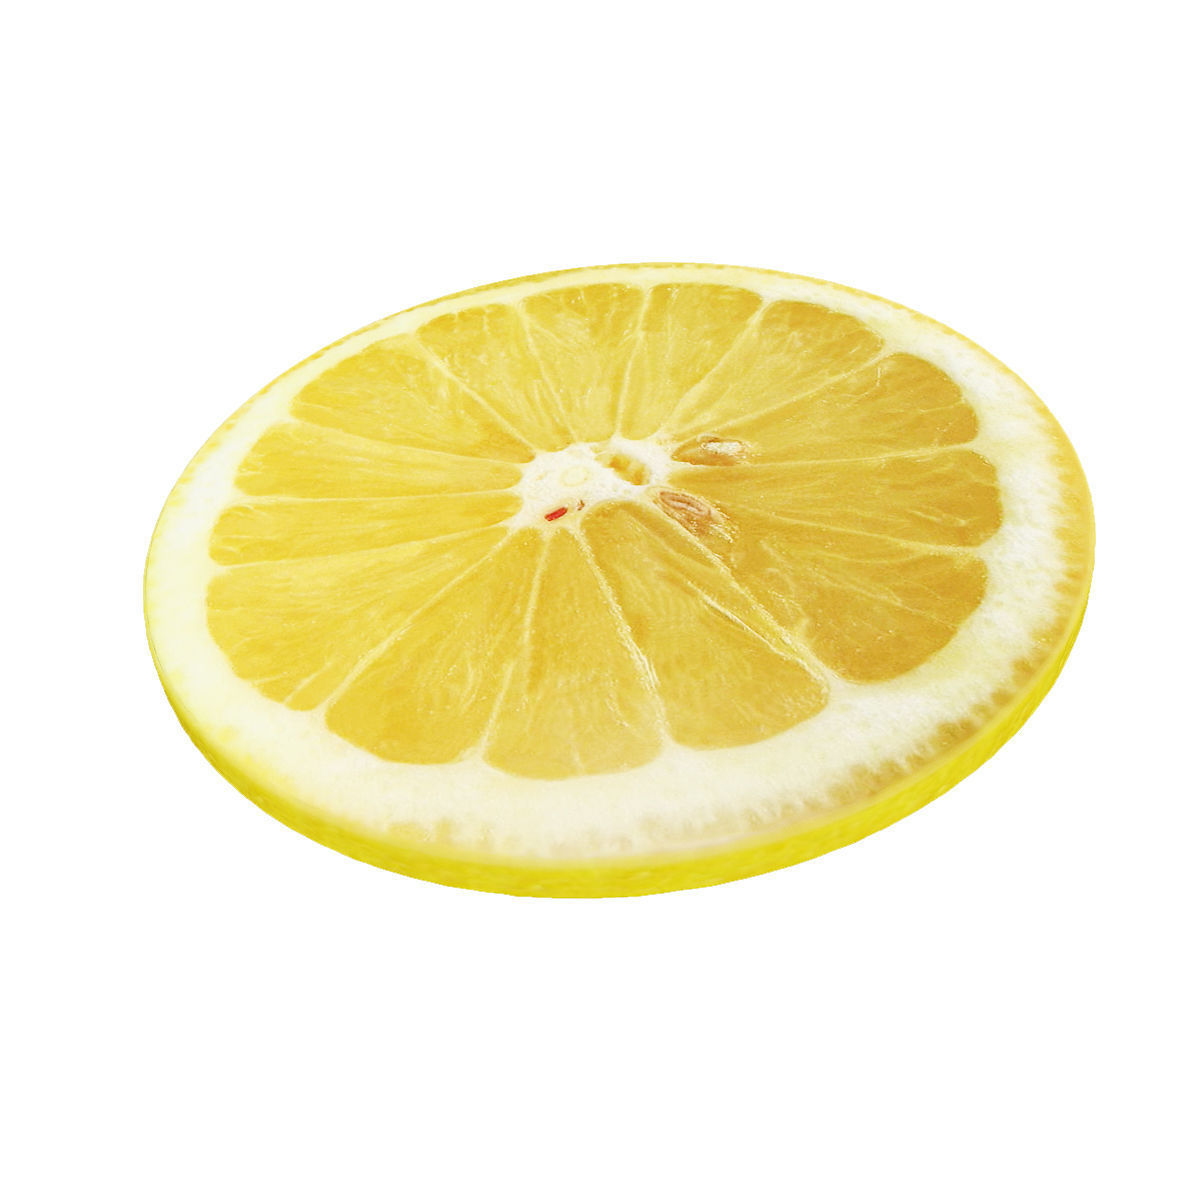 Lemon round slice